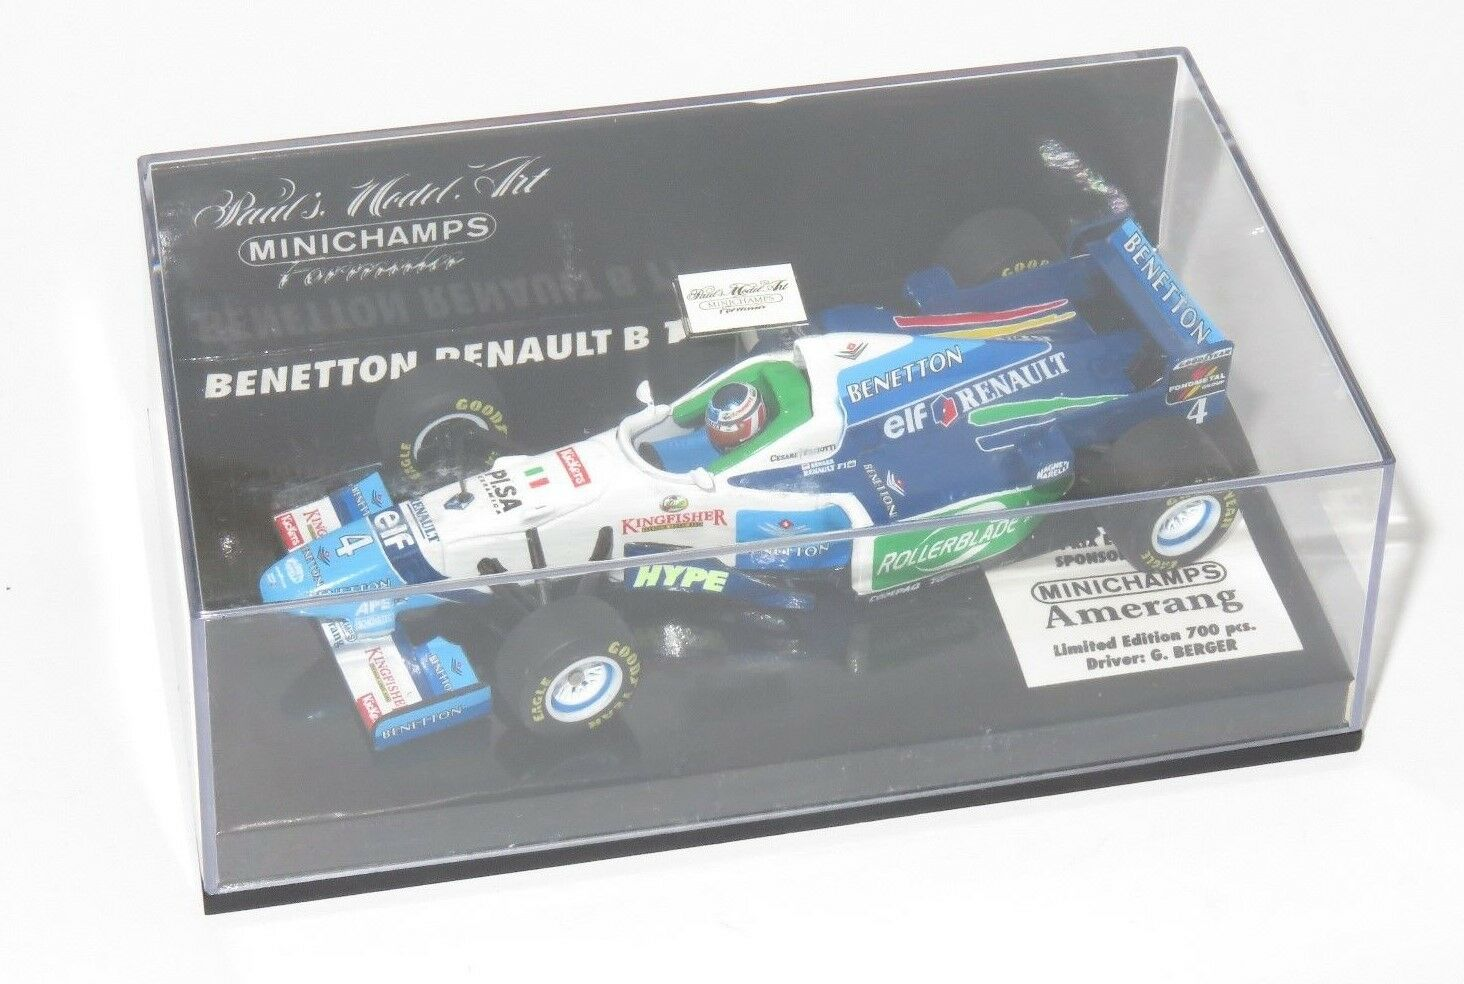 1 43 Benetton Benetton Benetton Renault B196 British Grand Prix edición 1996 Gerhard Berger 677f36